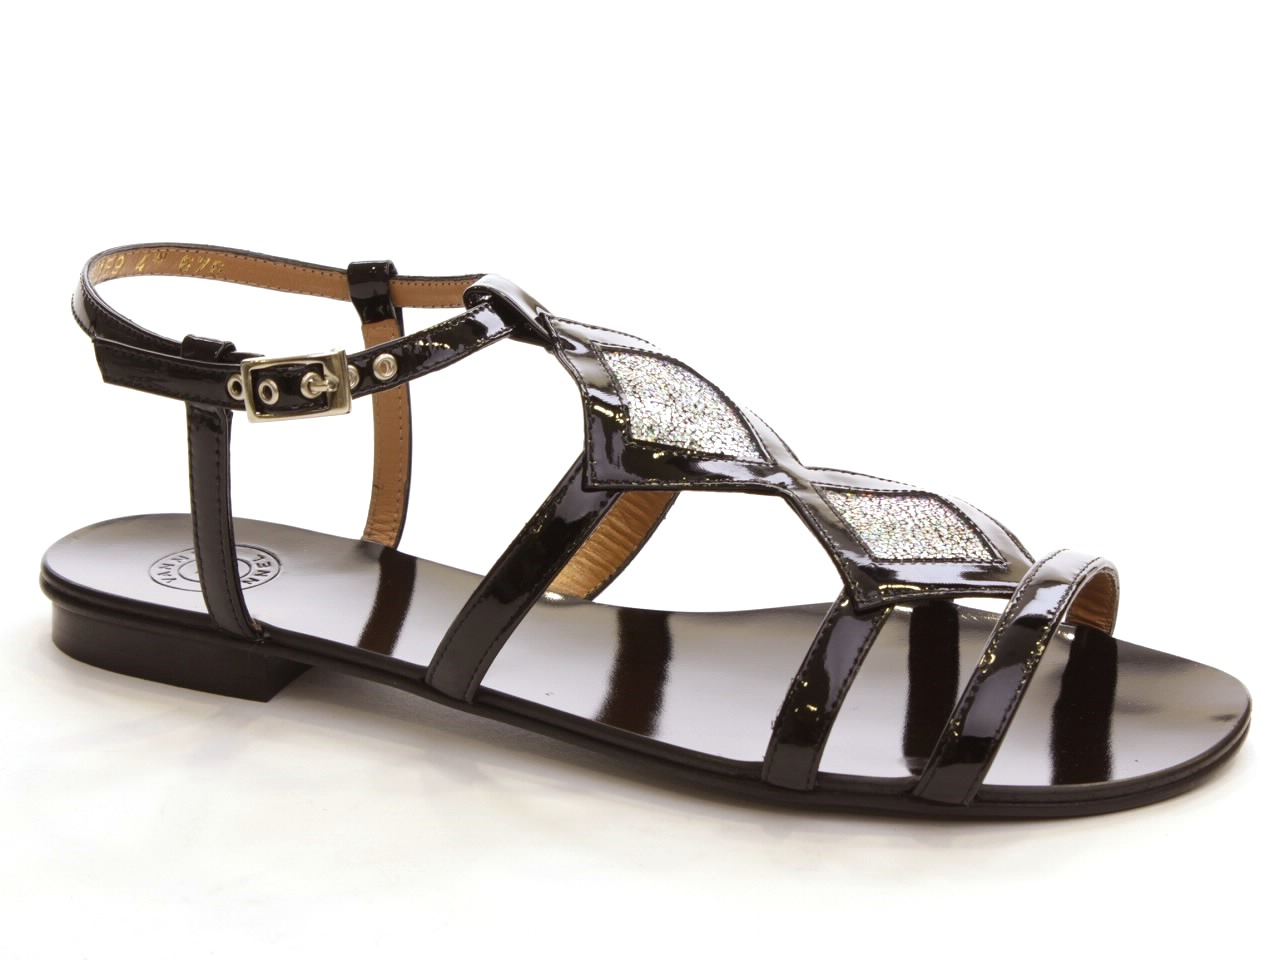 Sandales Plates Vannel - 001 8159